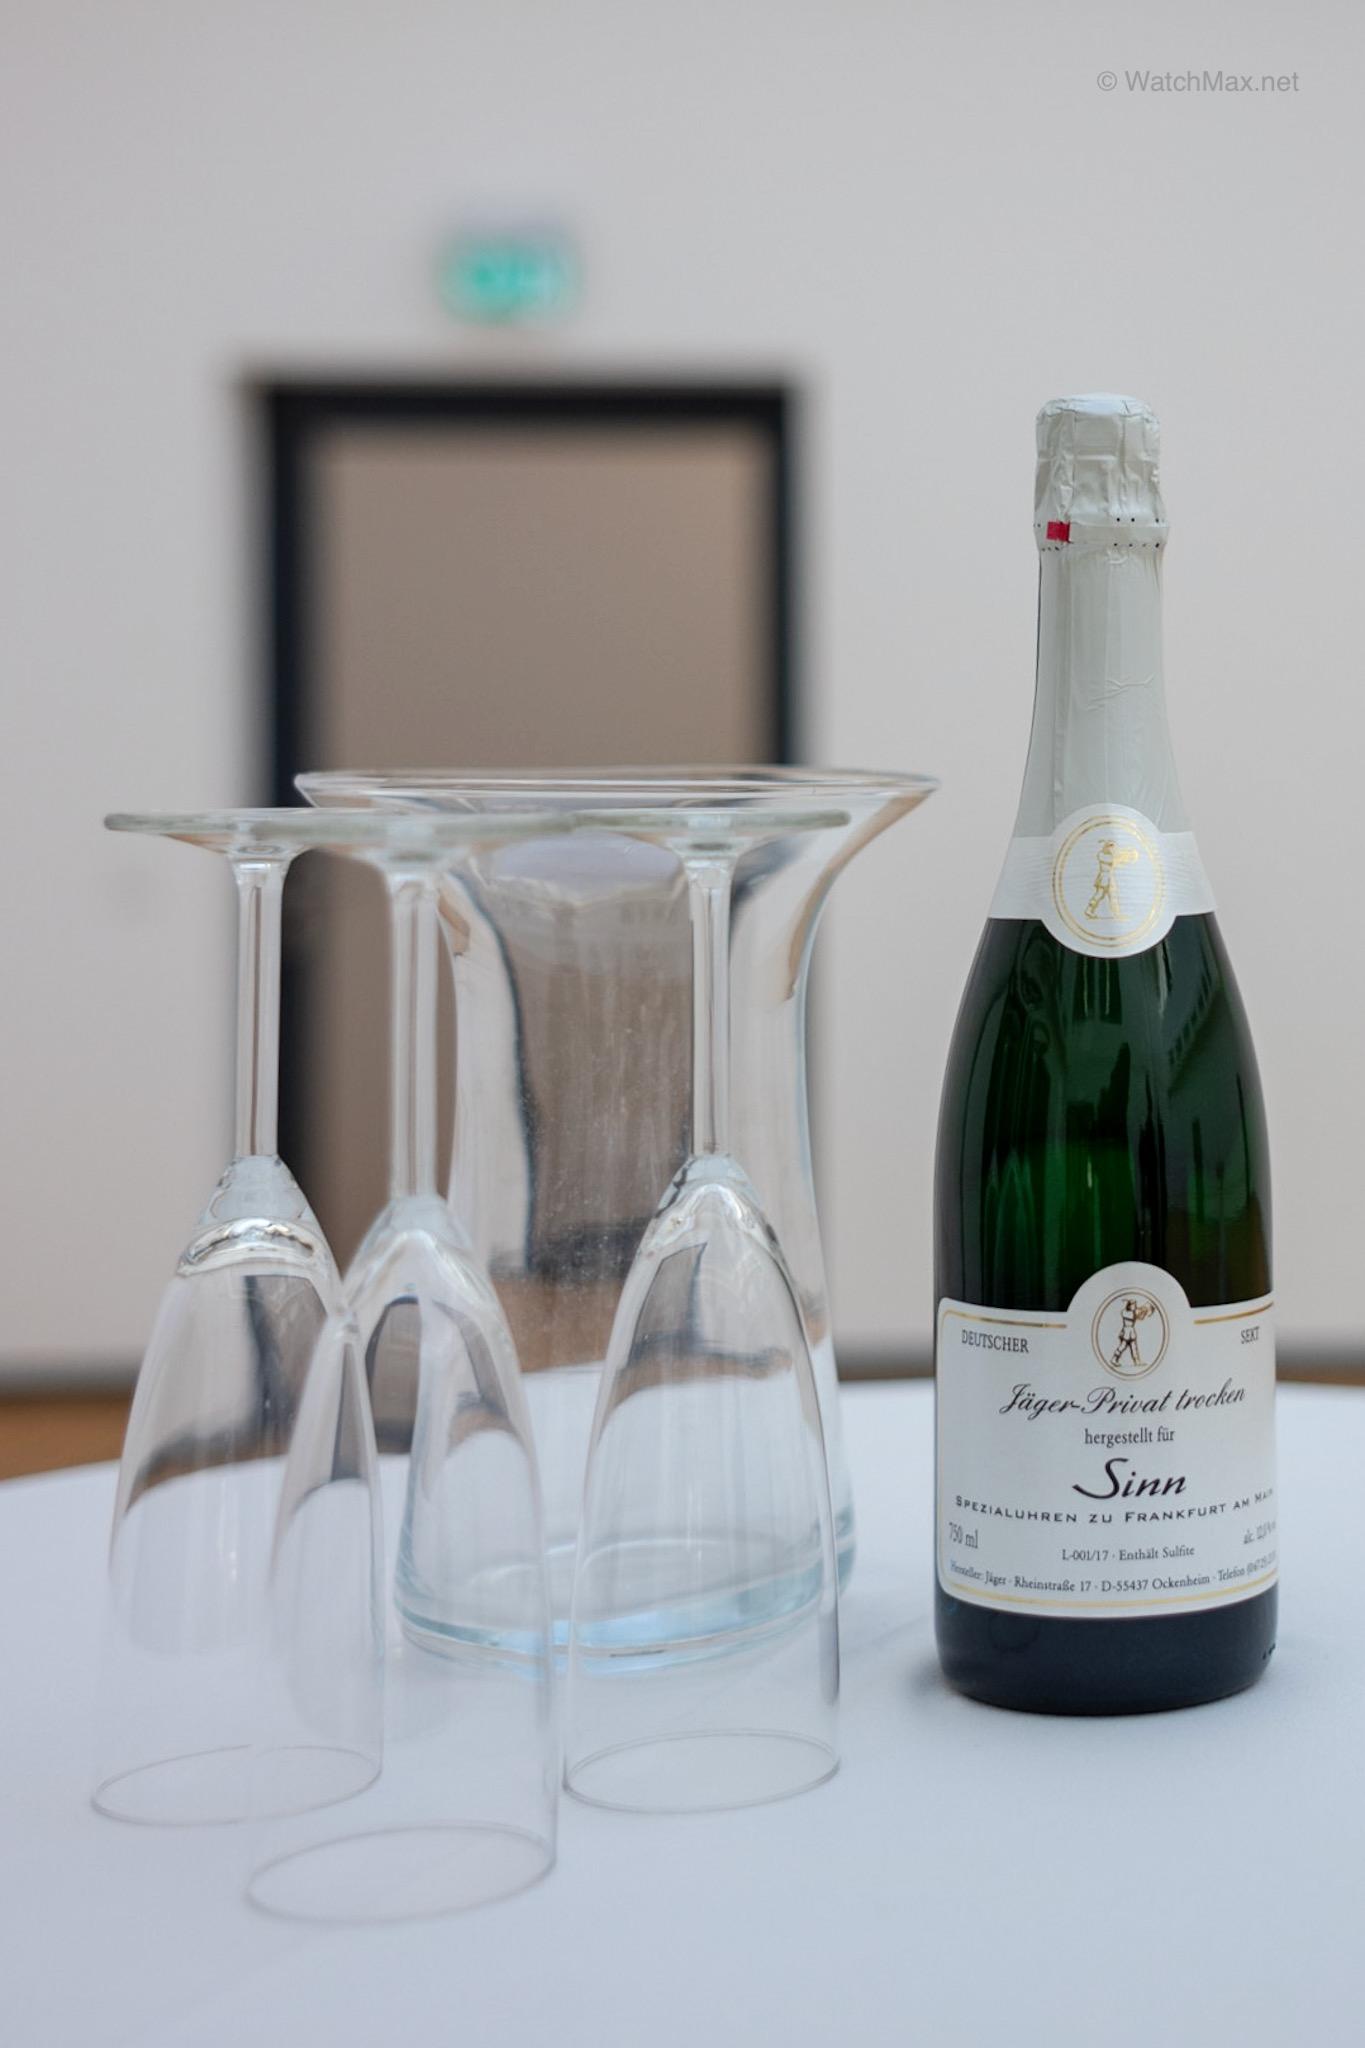 Sinn-branded sparkling wine